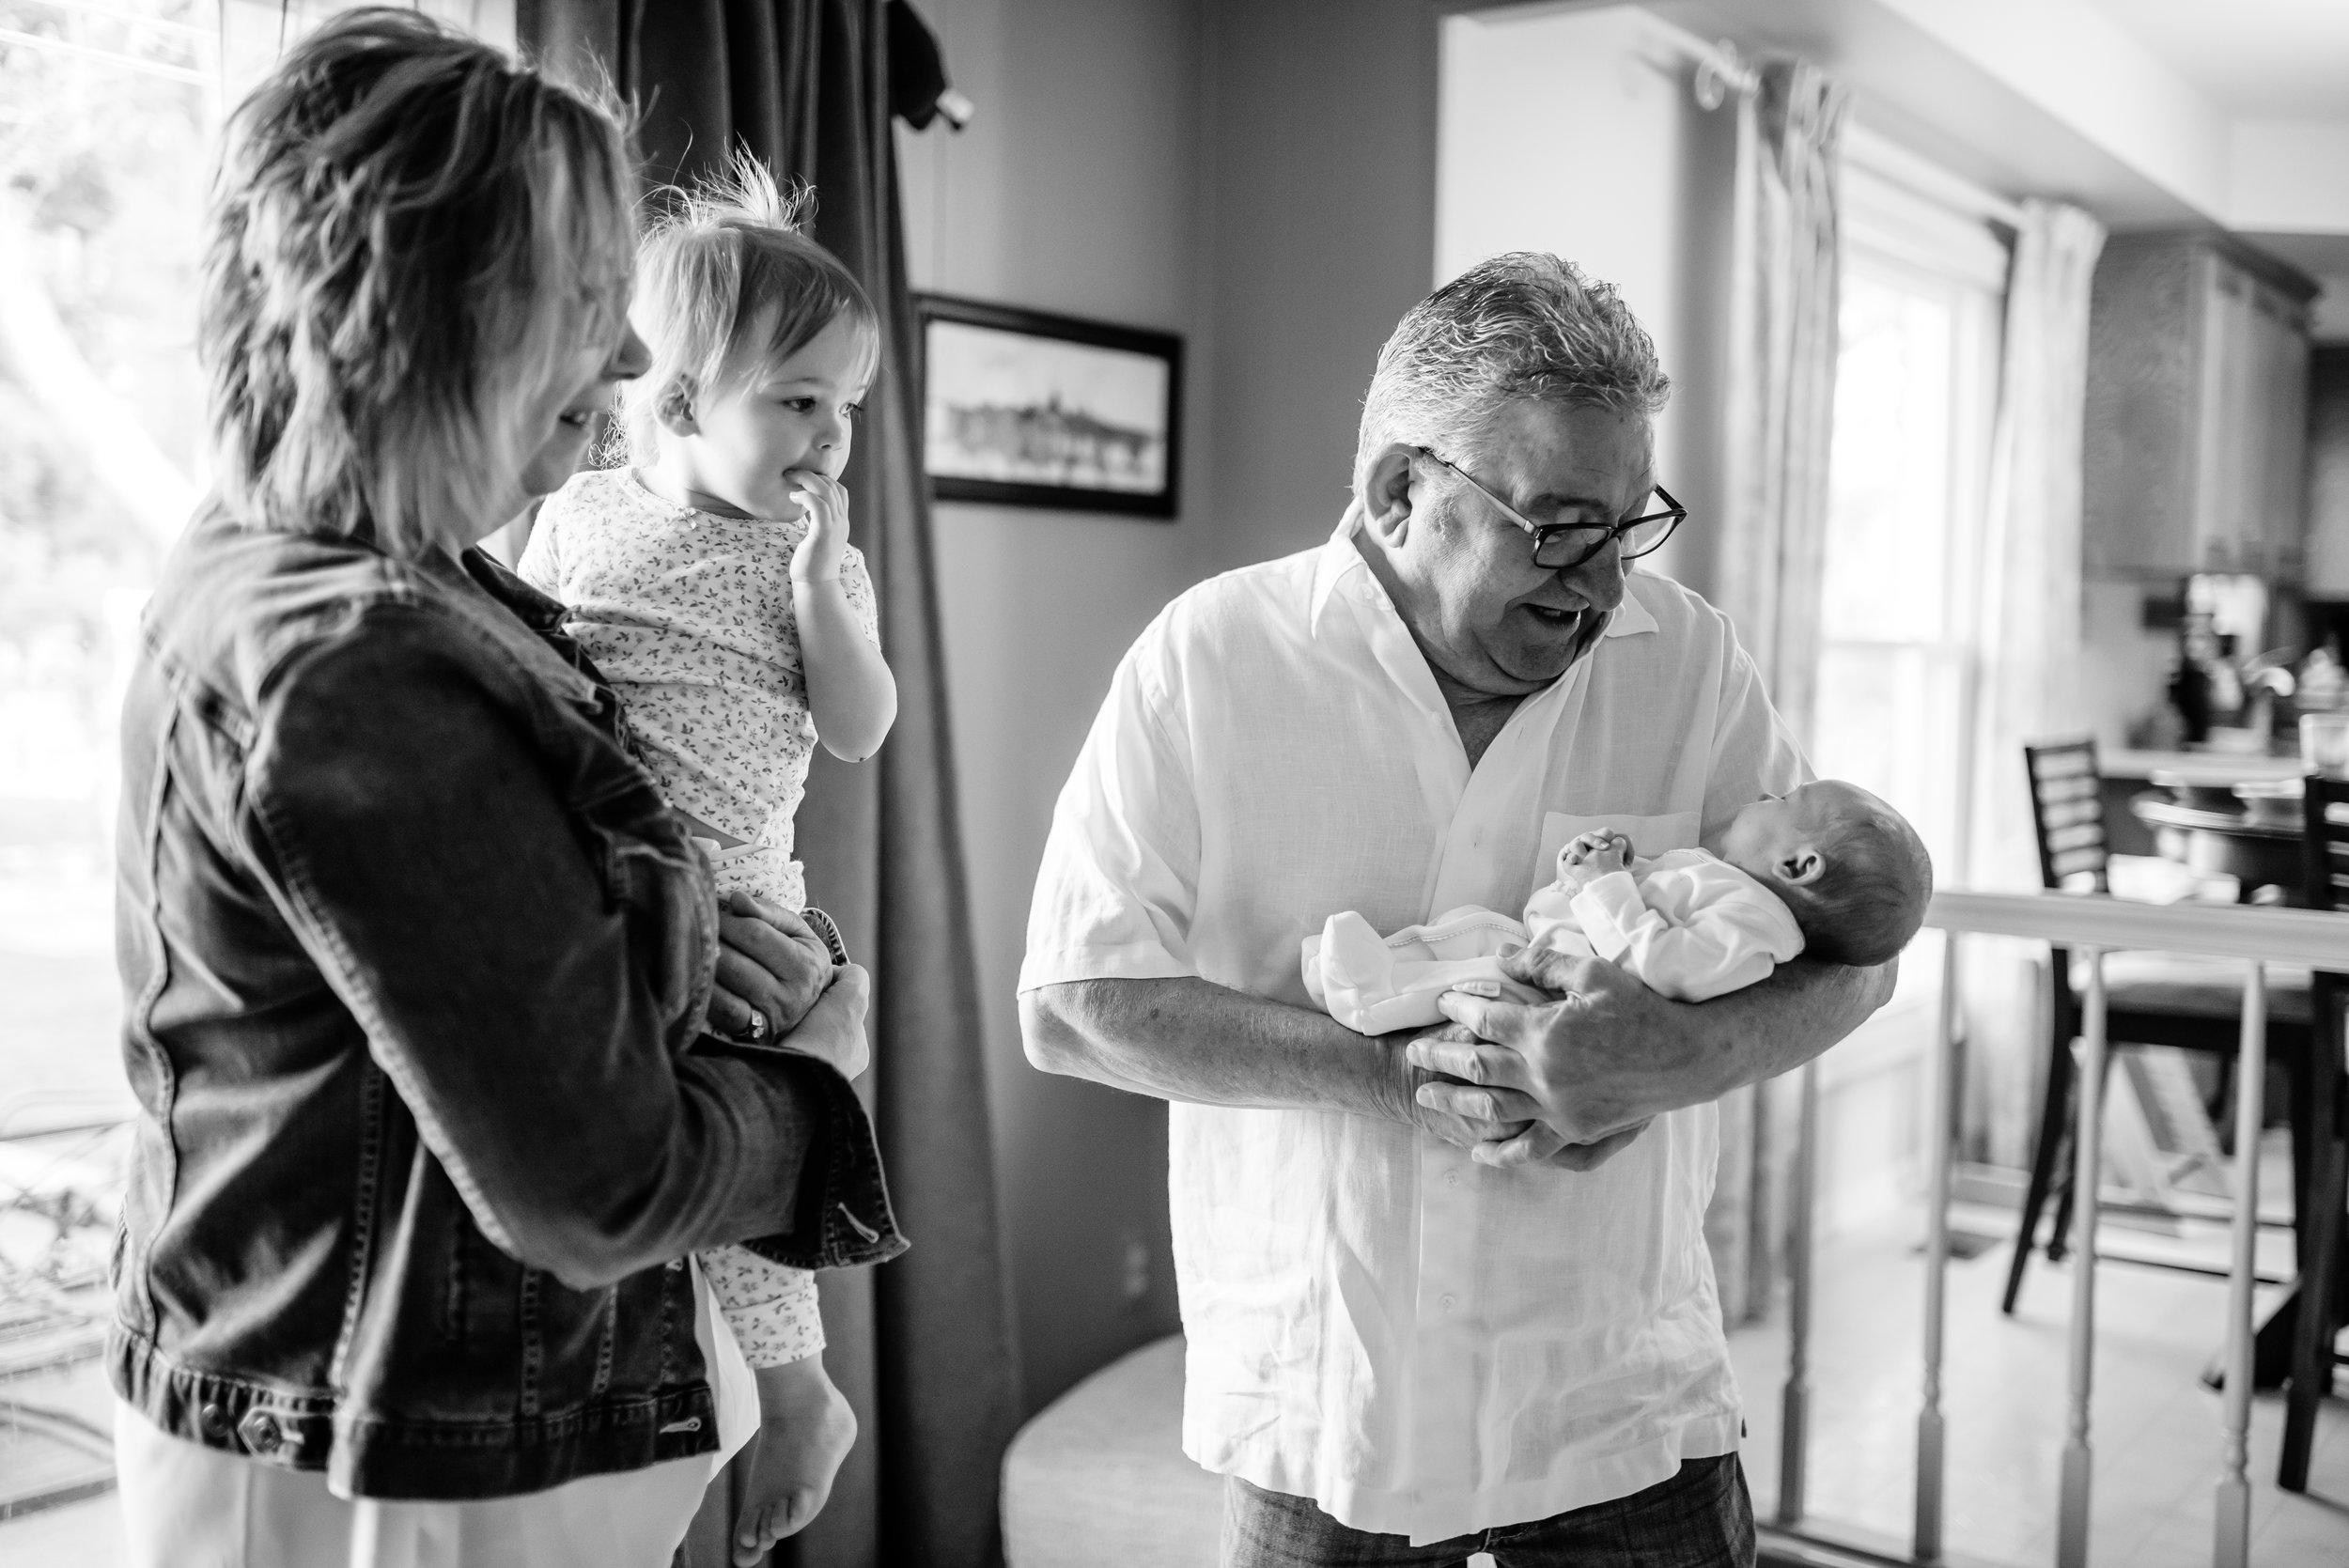 Grandma holds toddler, Grandpa holds newborn, all look at newborn